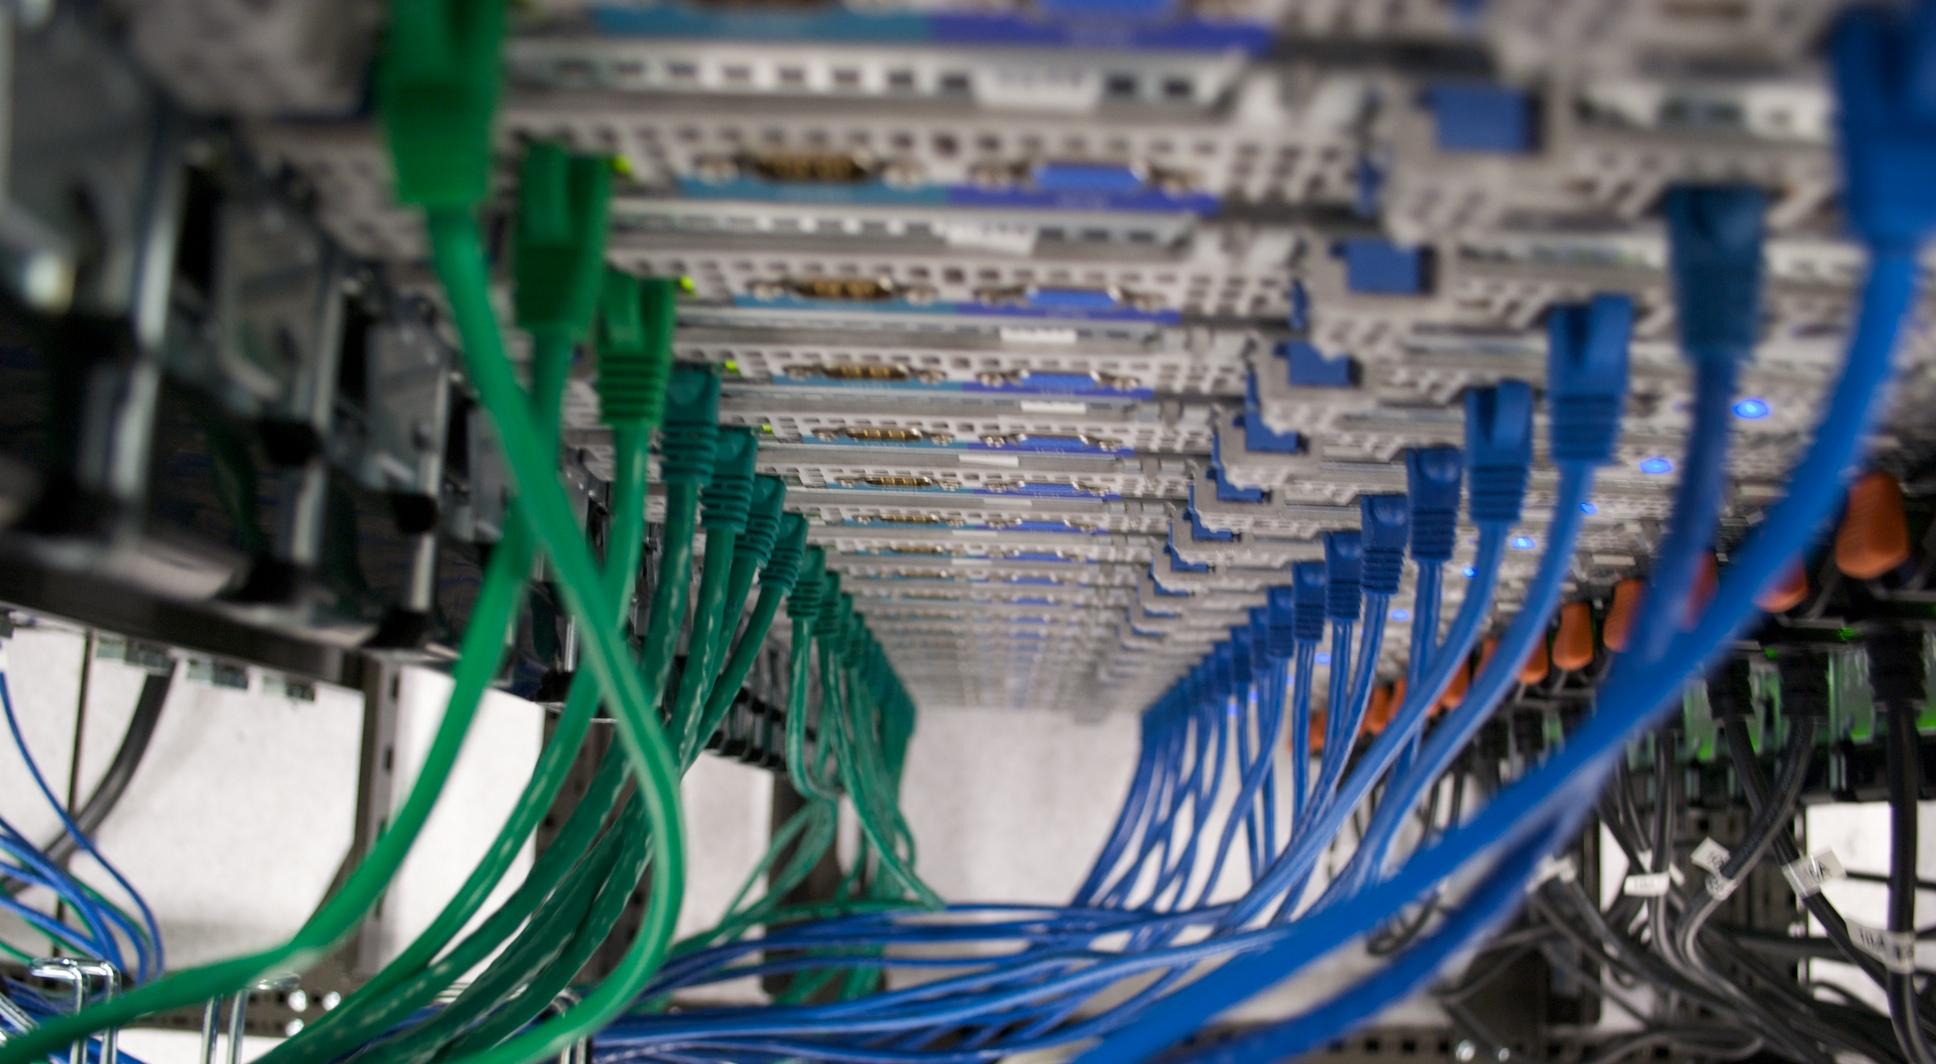 Tech Reviewer Thousands At Risk Of Heartbleed Server Bug